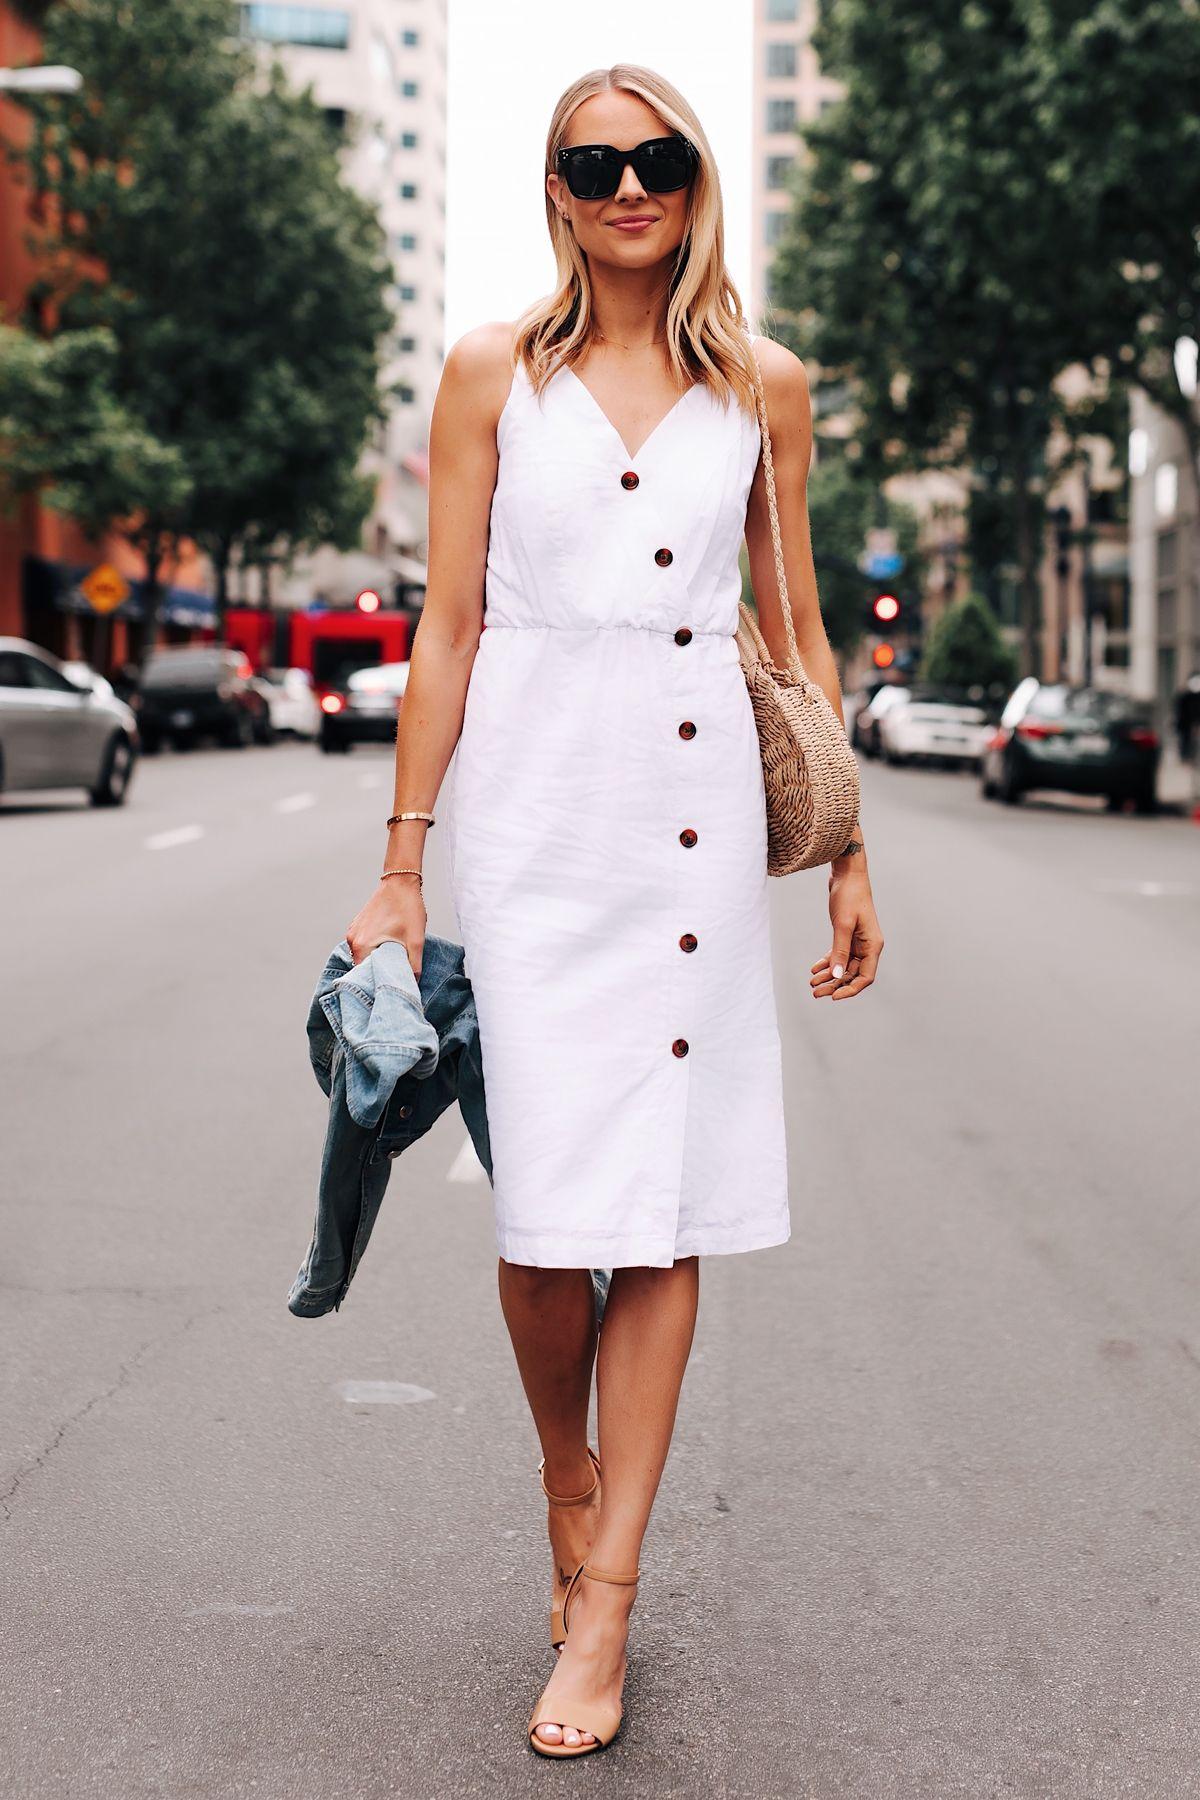 Fashion Jackson Wearing White Midi Dress Denim Jacket Tan Ankle Strap Heeled Sandals 1 Fashion Jackson Fashion Stylish Summer Outfits [ 1800 x 1200 Pixel ]